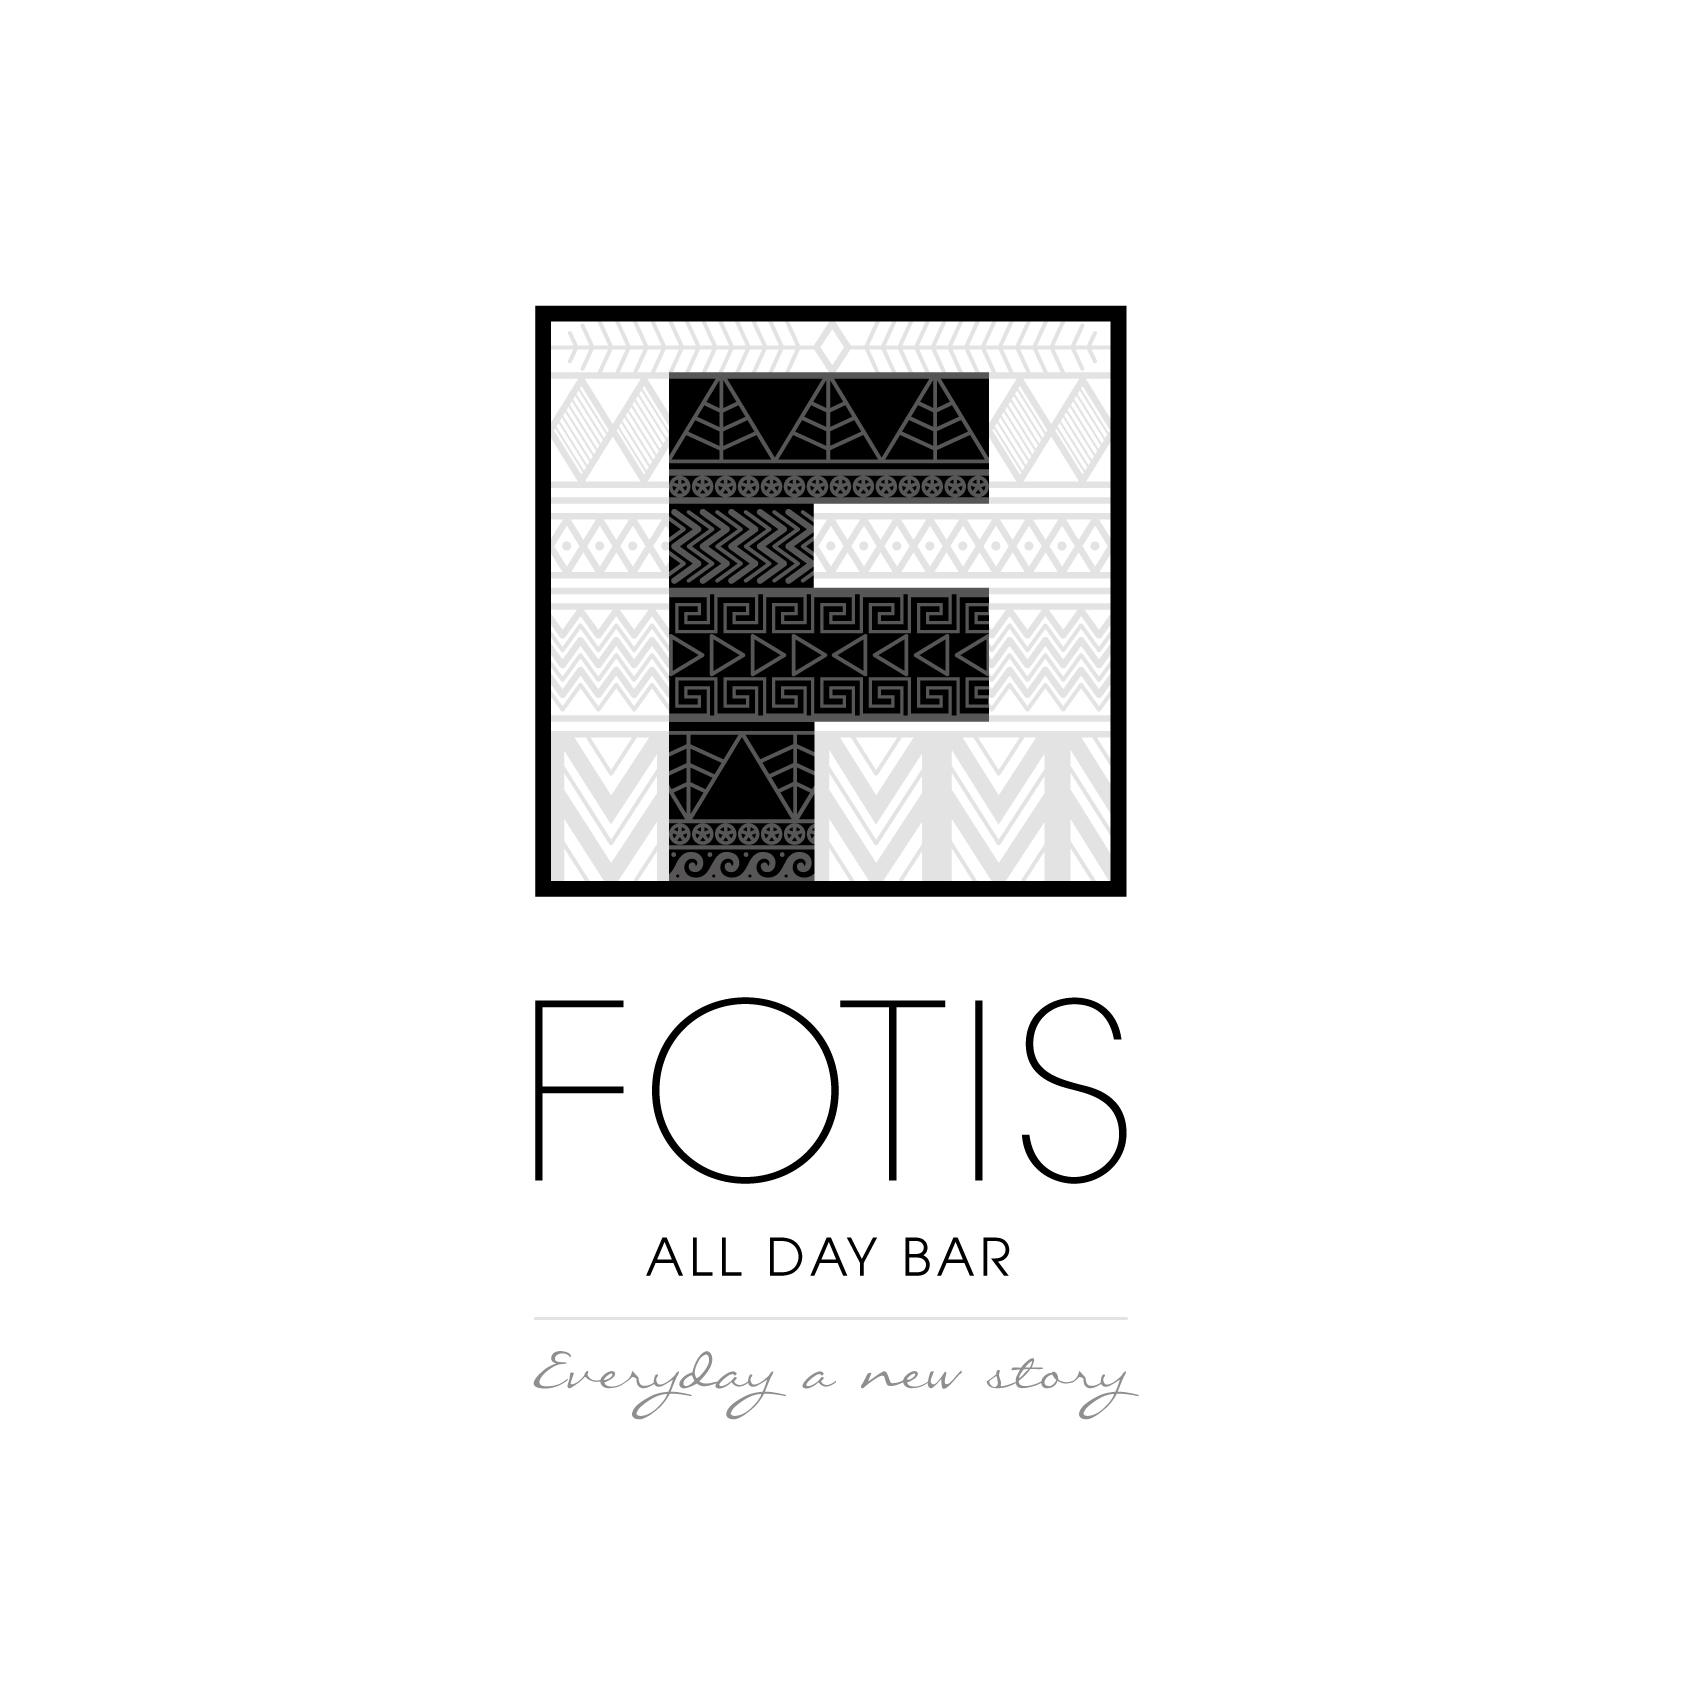 A3-DESIGN-FOTIS-ALL-DAY-BAR-LOGO